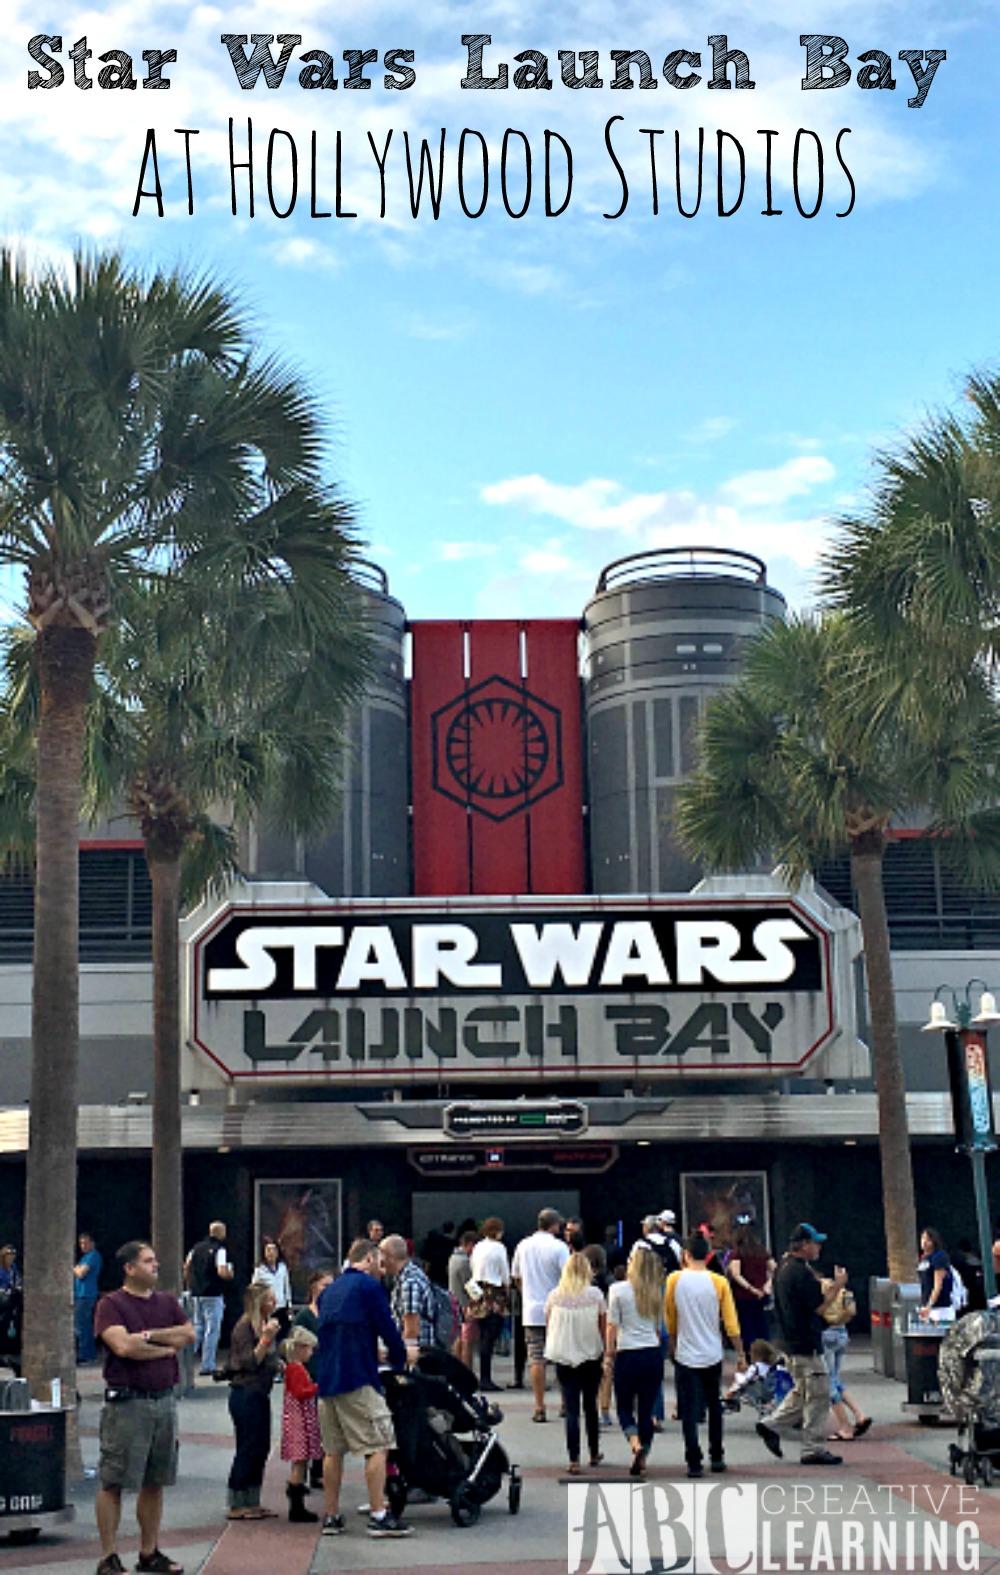 Star Wars Launch Bay at Hollywood Studios Disney